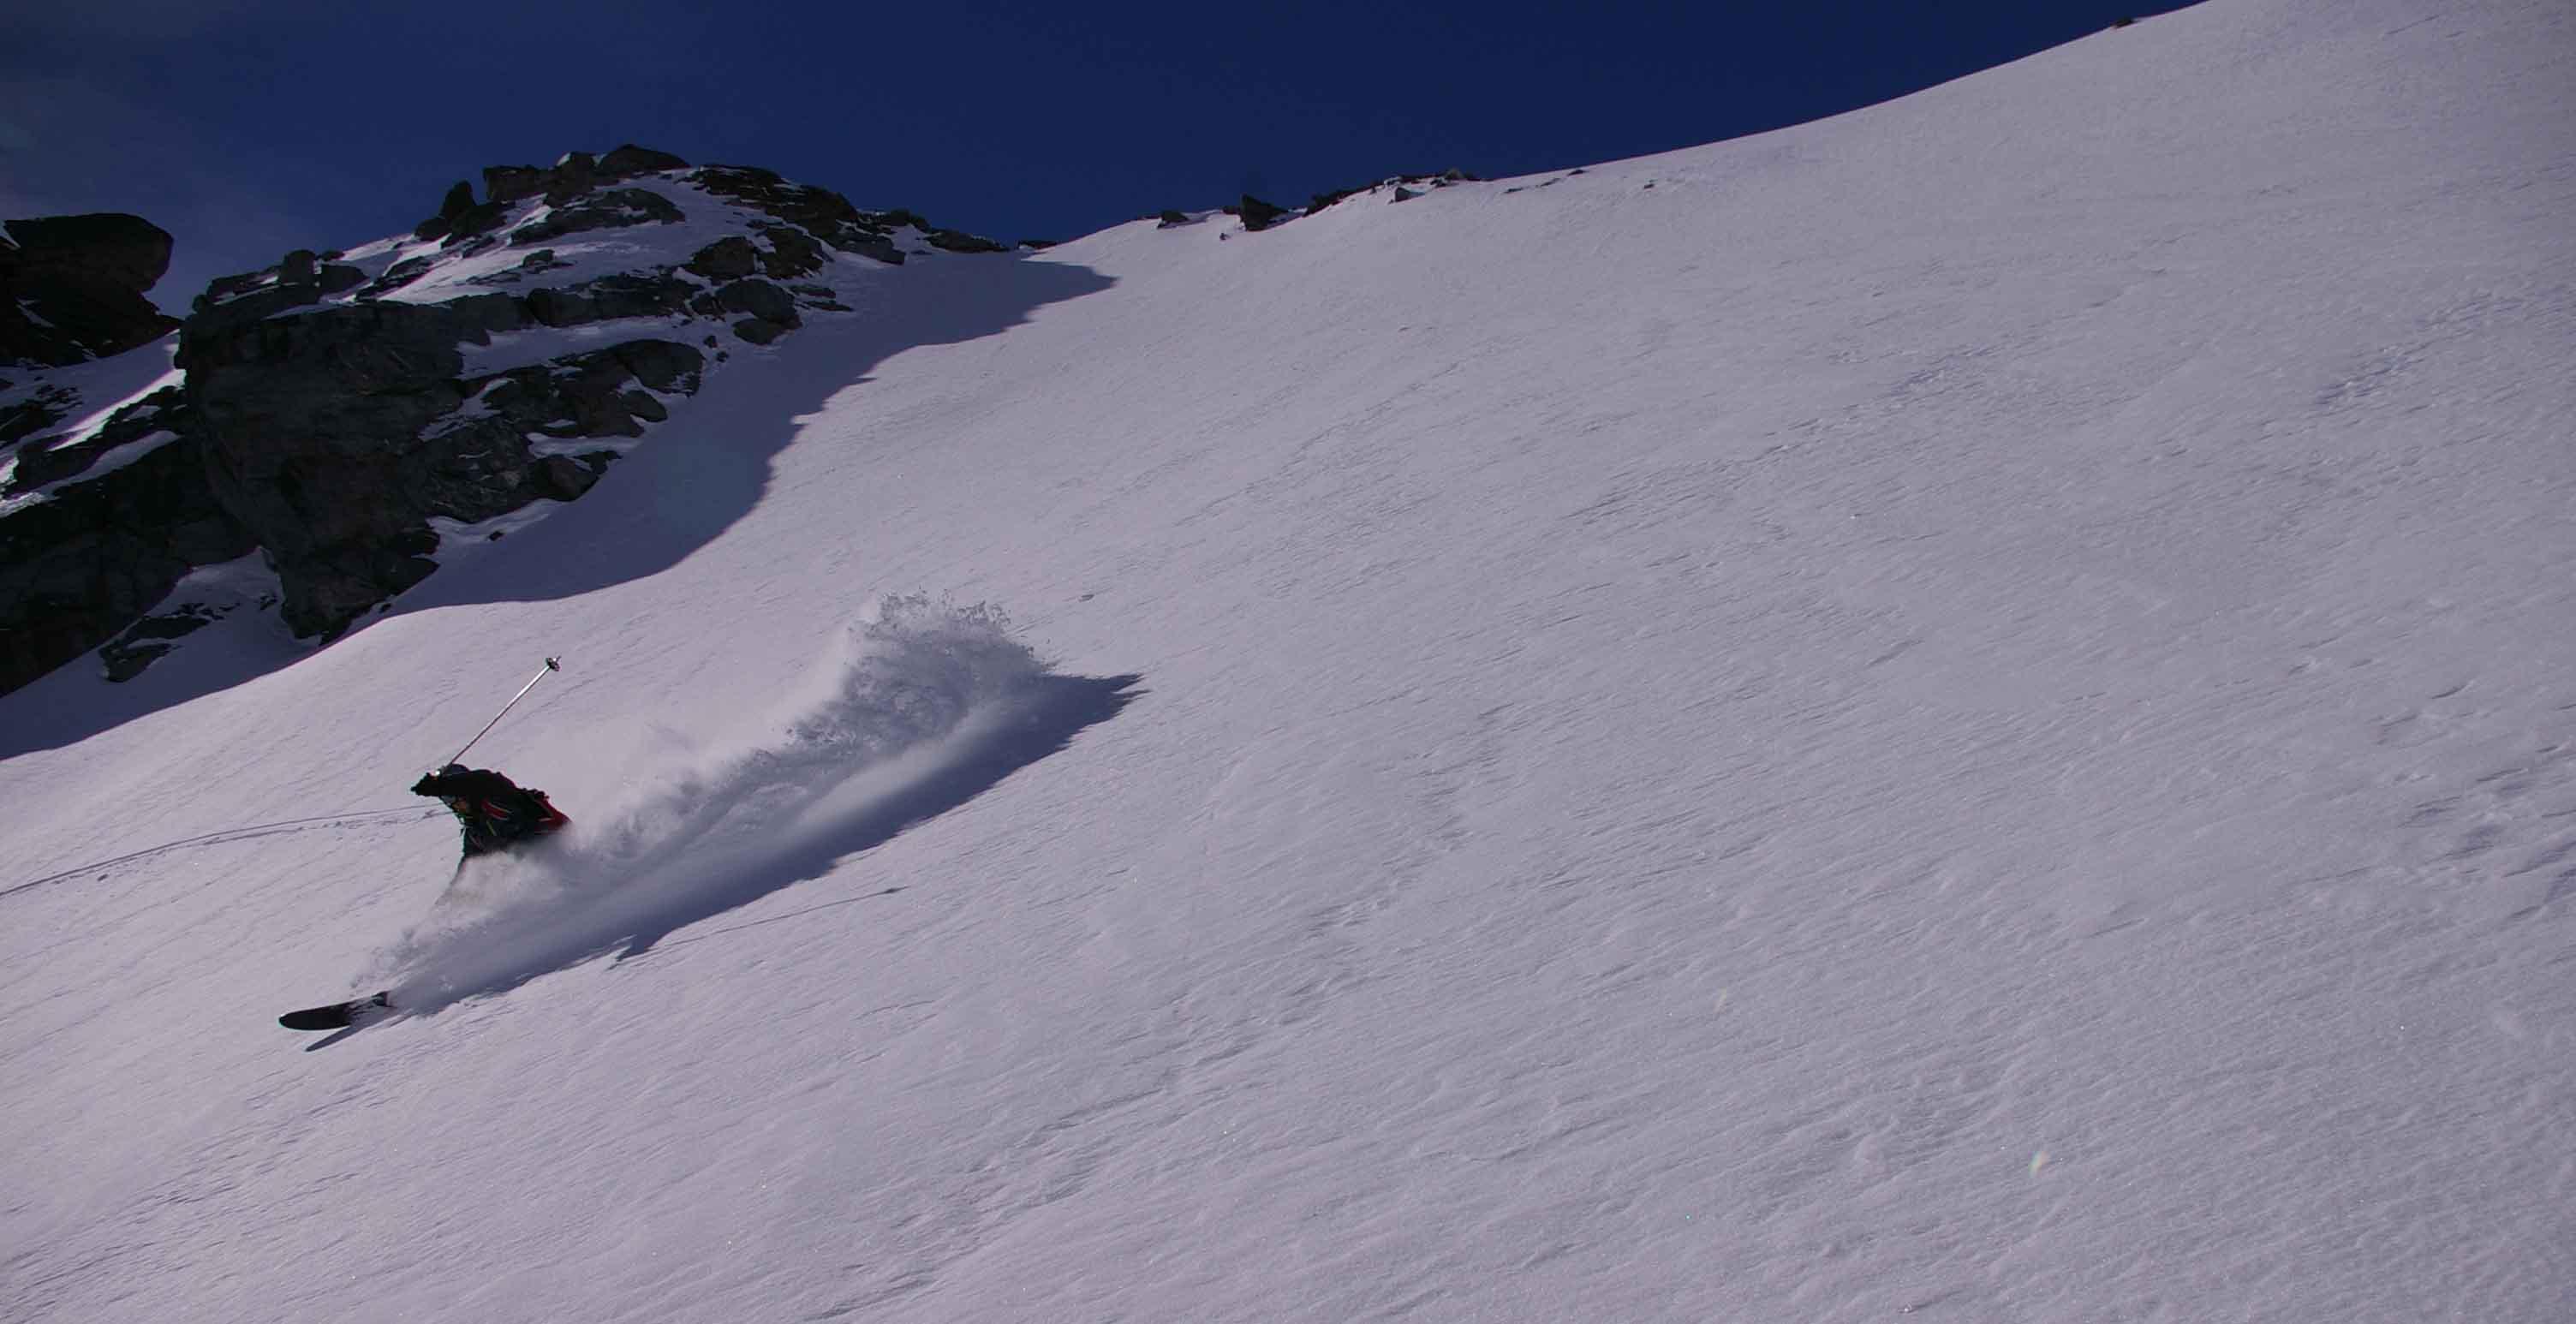 009 Amon Dava ski bois eddy